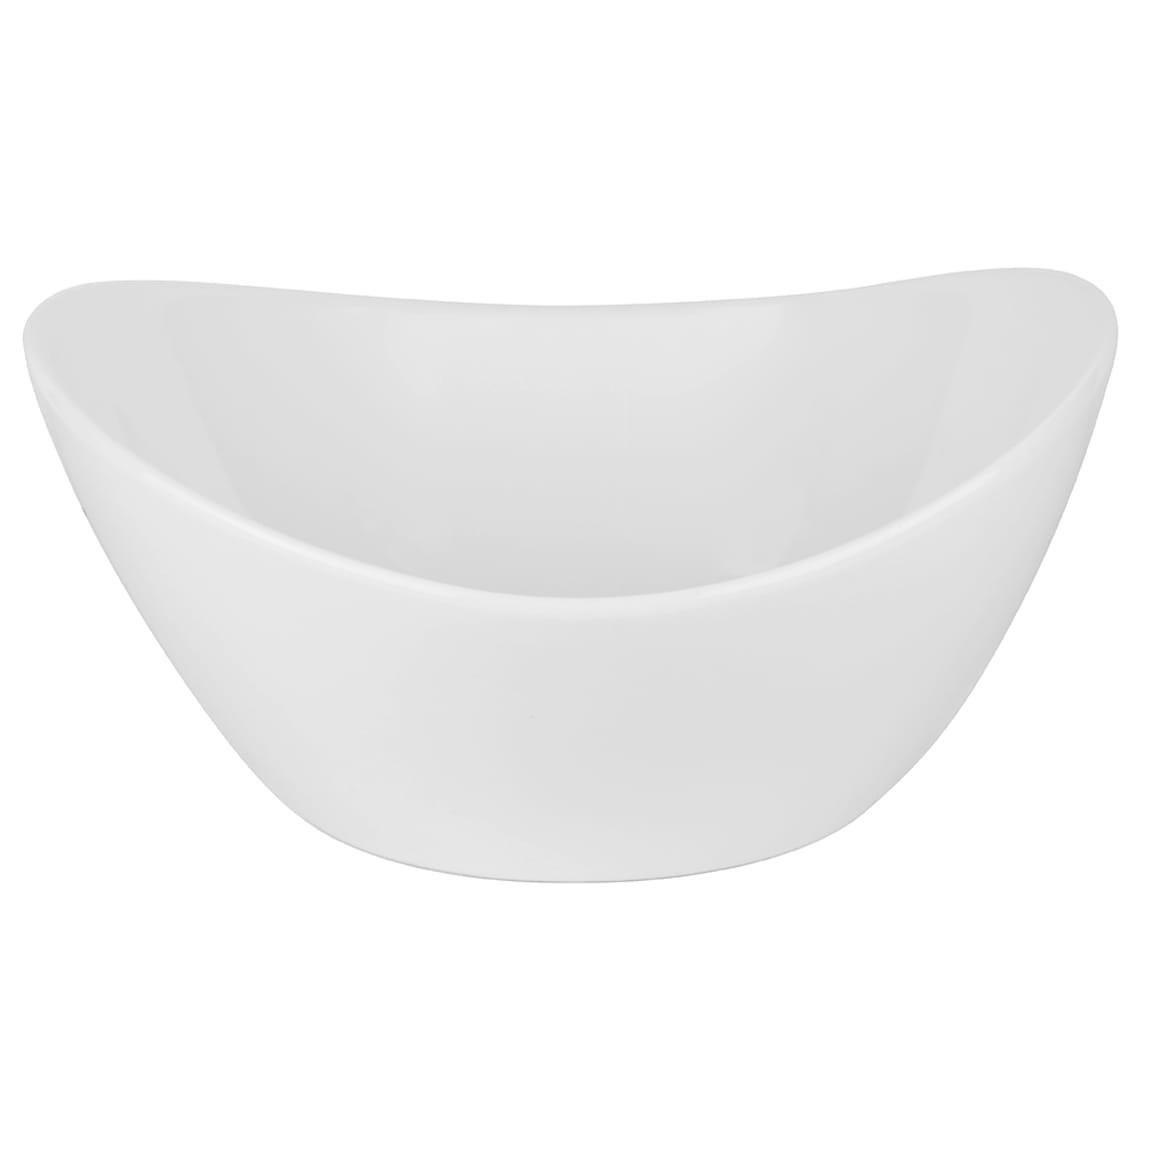 10 Strawberry Street A19481 32 oz Oval Boat Bowl - Porcelain, White